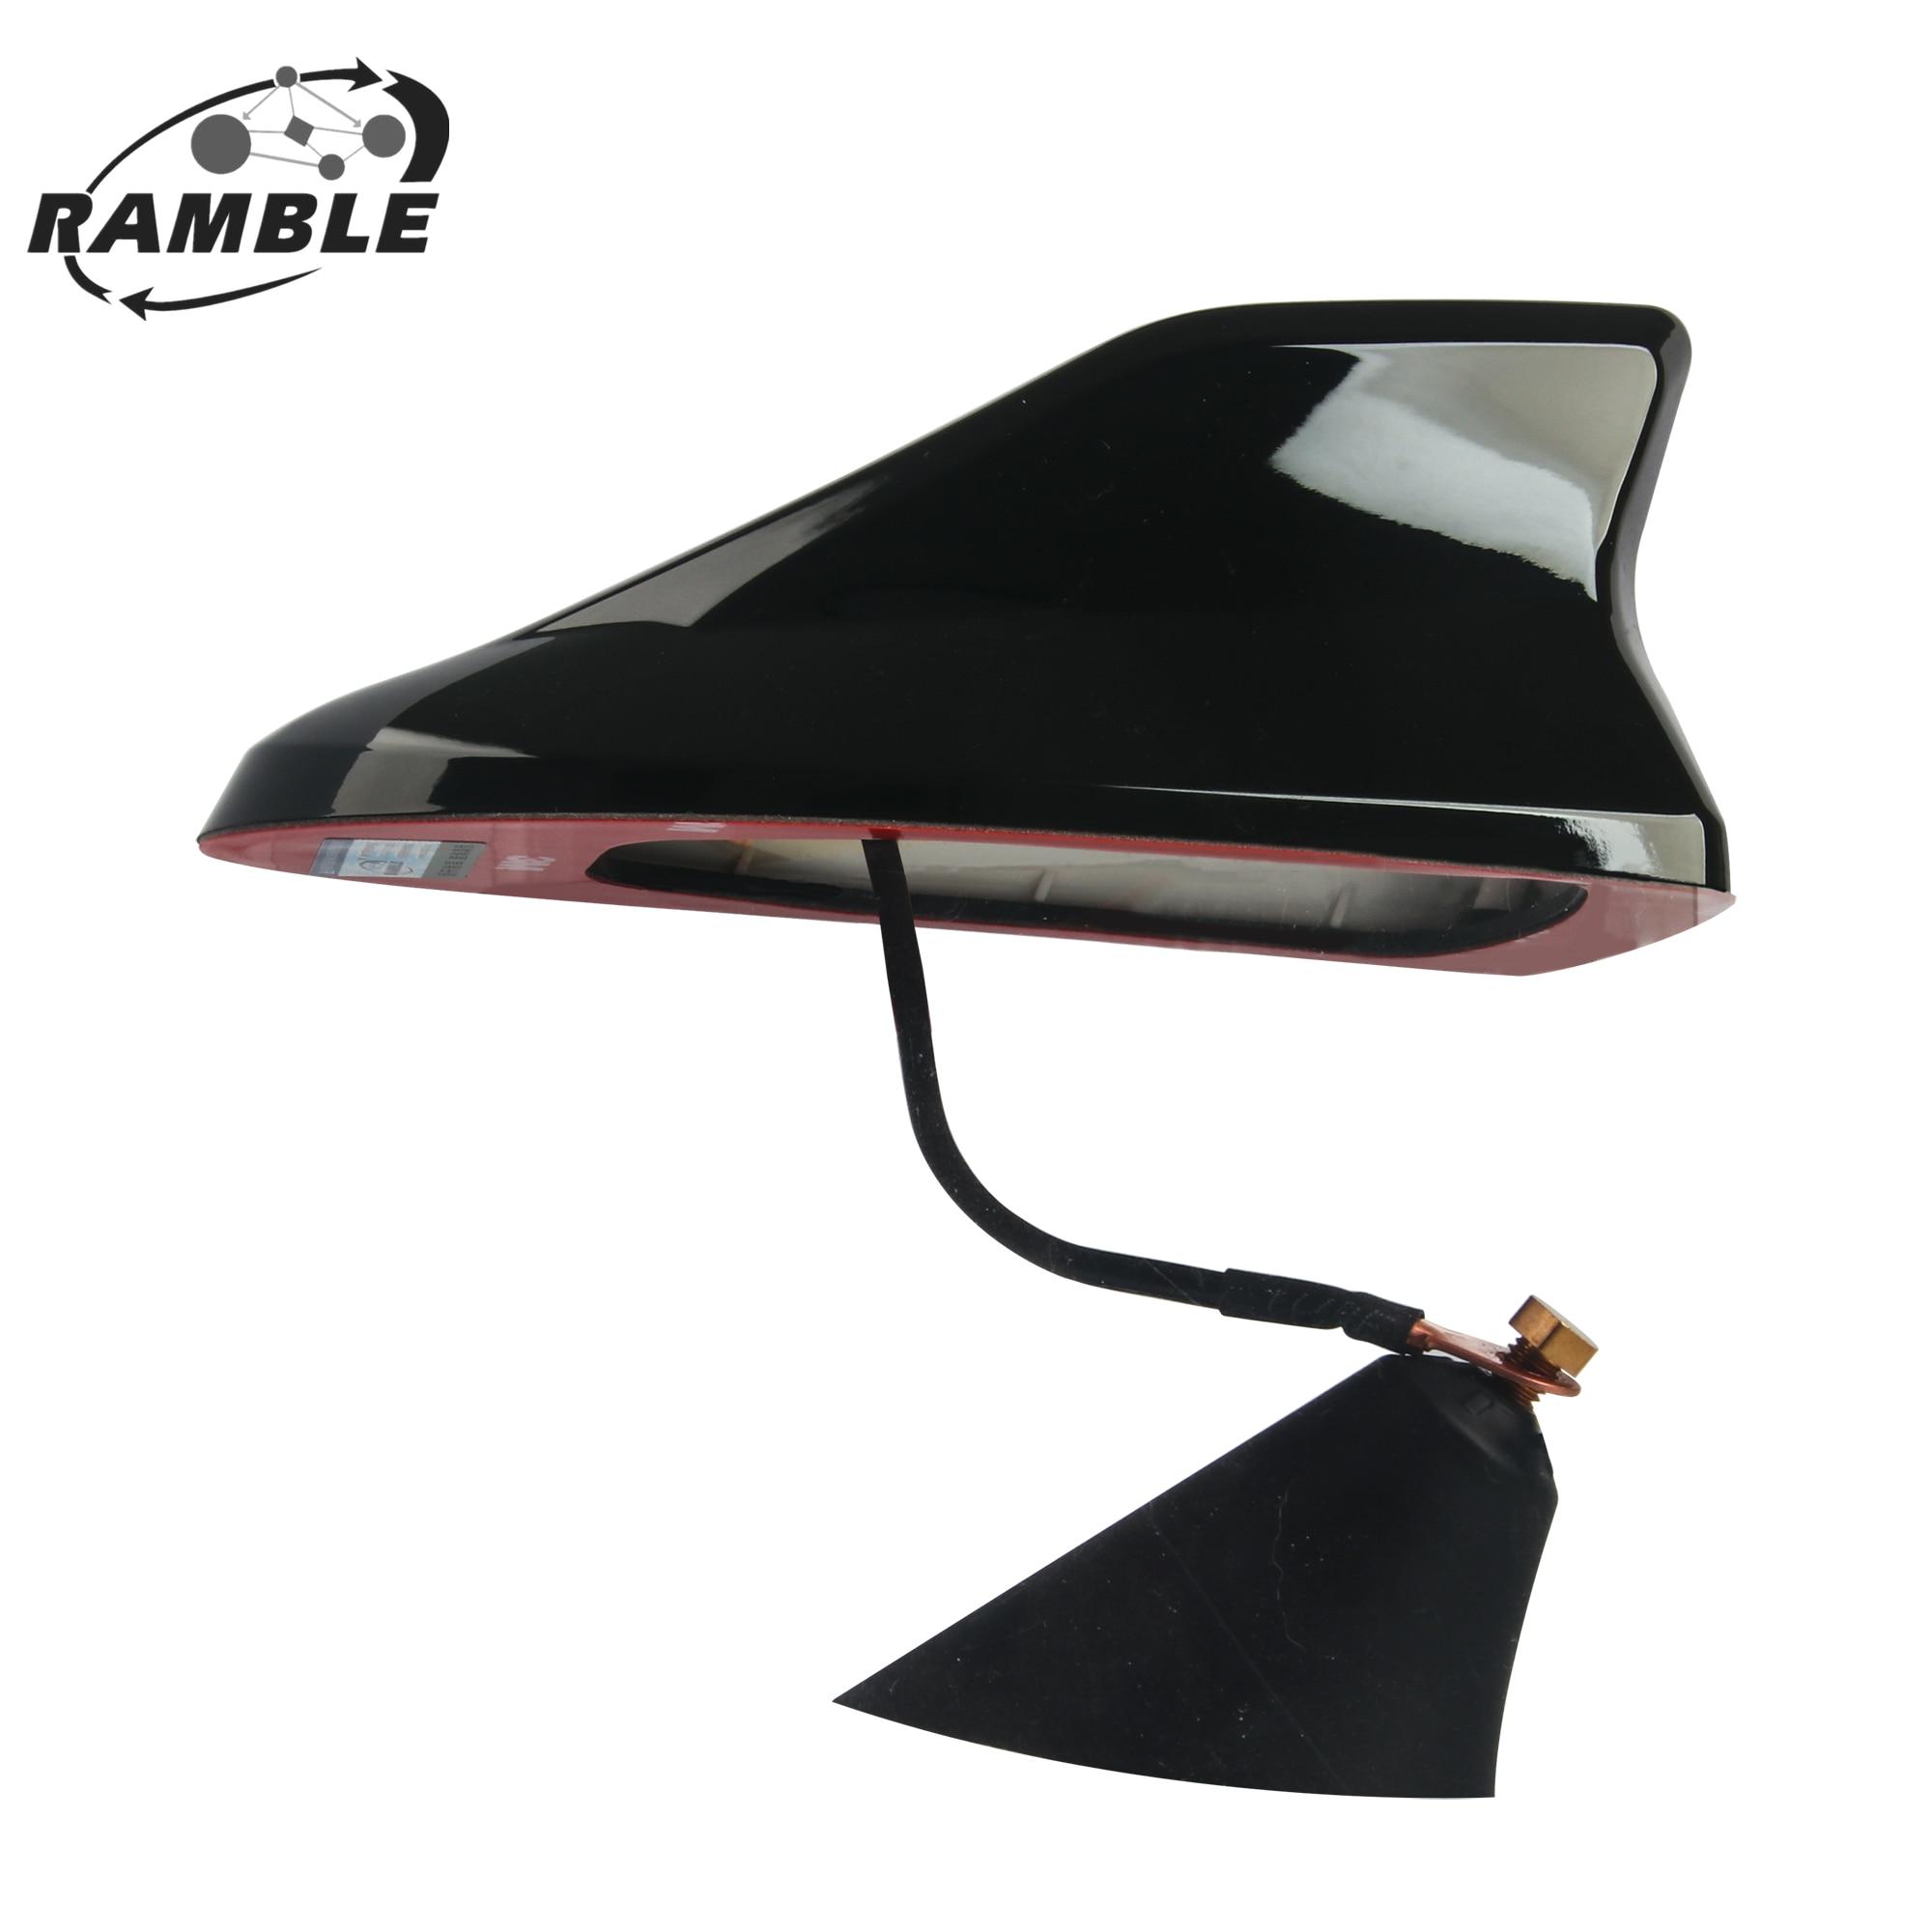 Ramble Kia Forte Replacements Super Shark Fin Antenna Car Radio Aerial Strong Signal Roof Antena Car